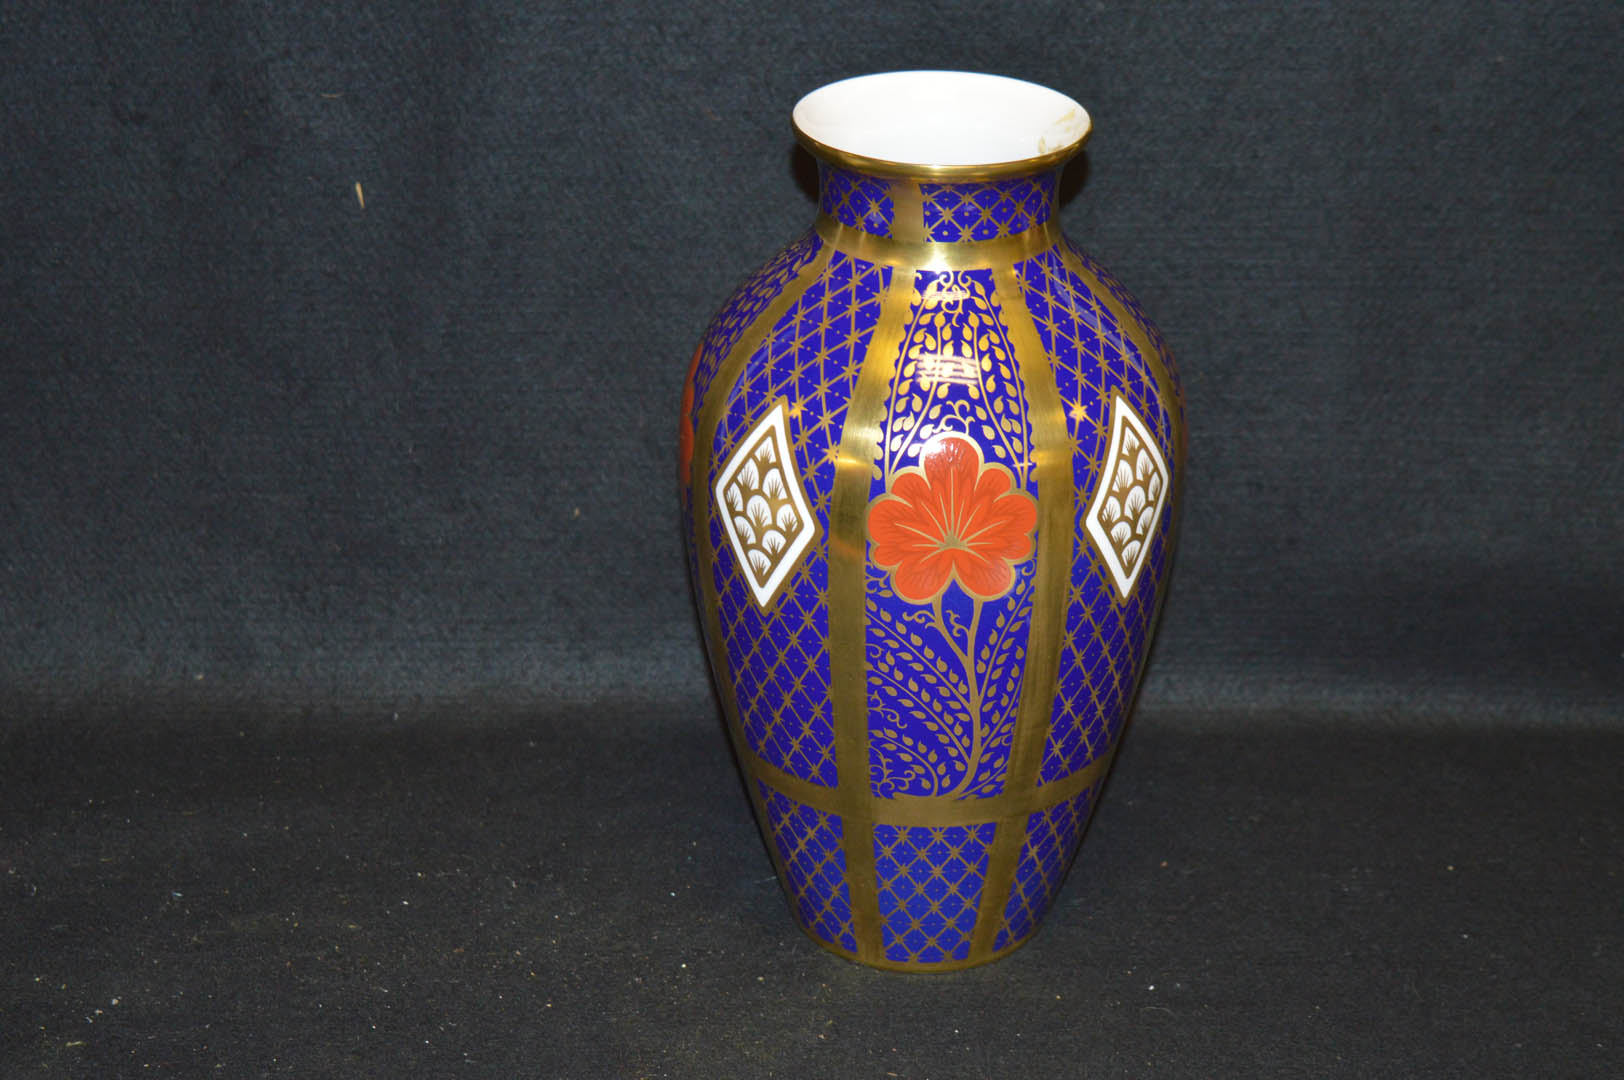 Lot 33 - A Caverswall China, Romany Thames Vase